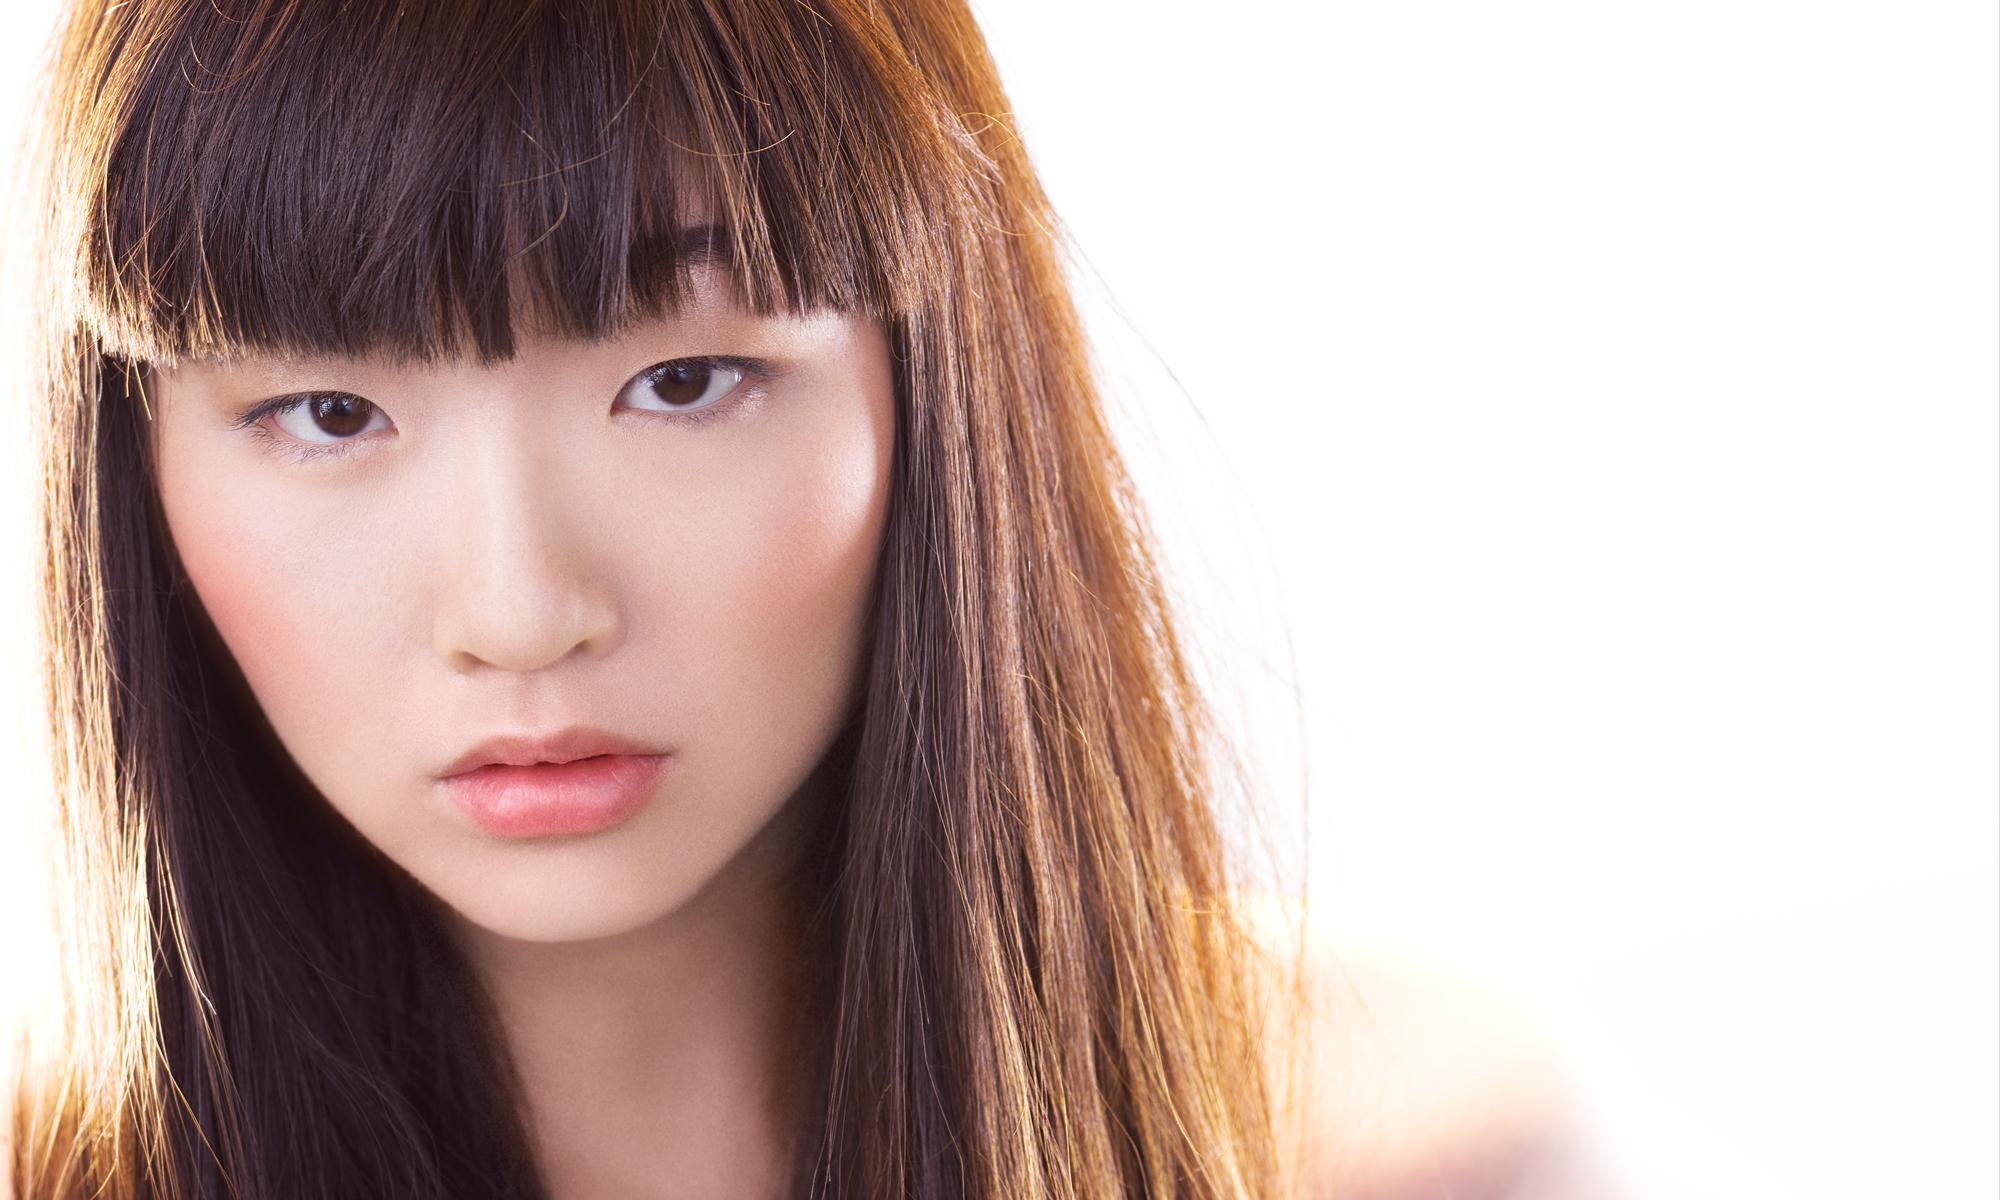 Natural asian beauty,makeup retouching thomas canny studio.jpg